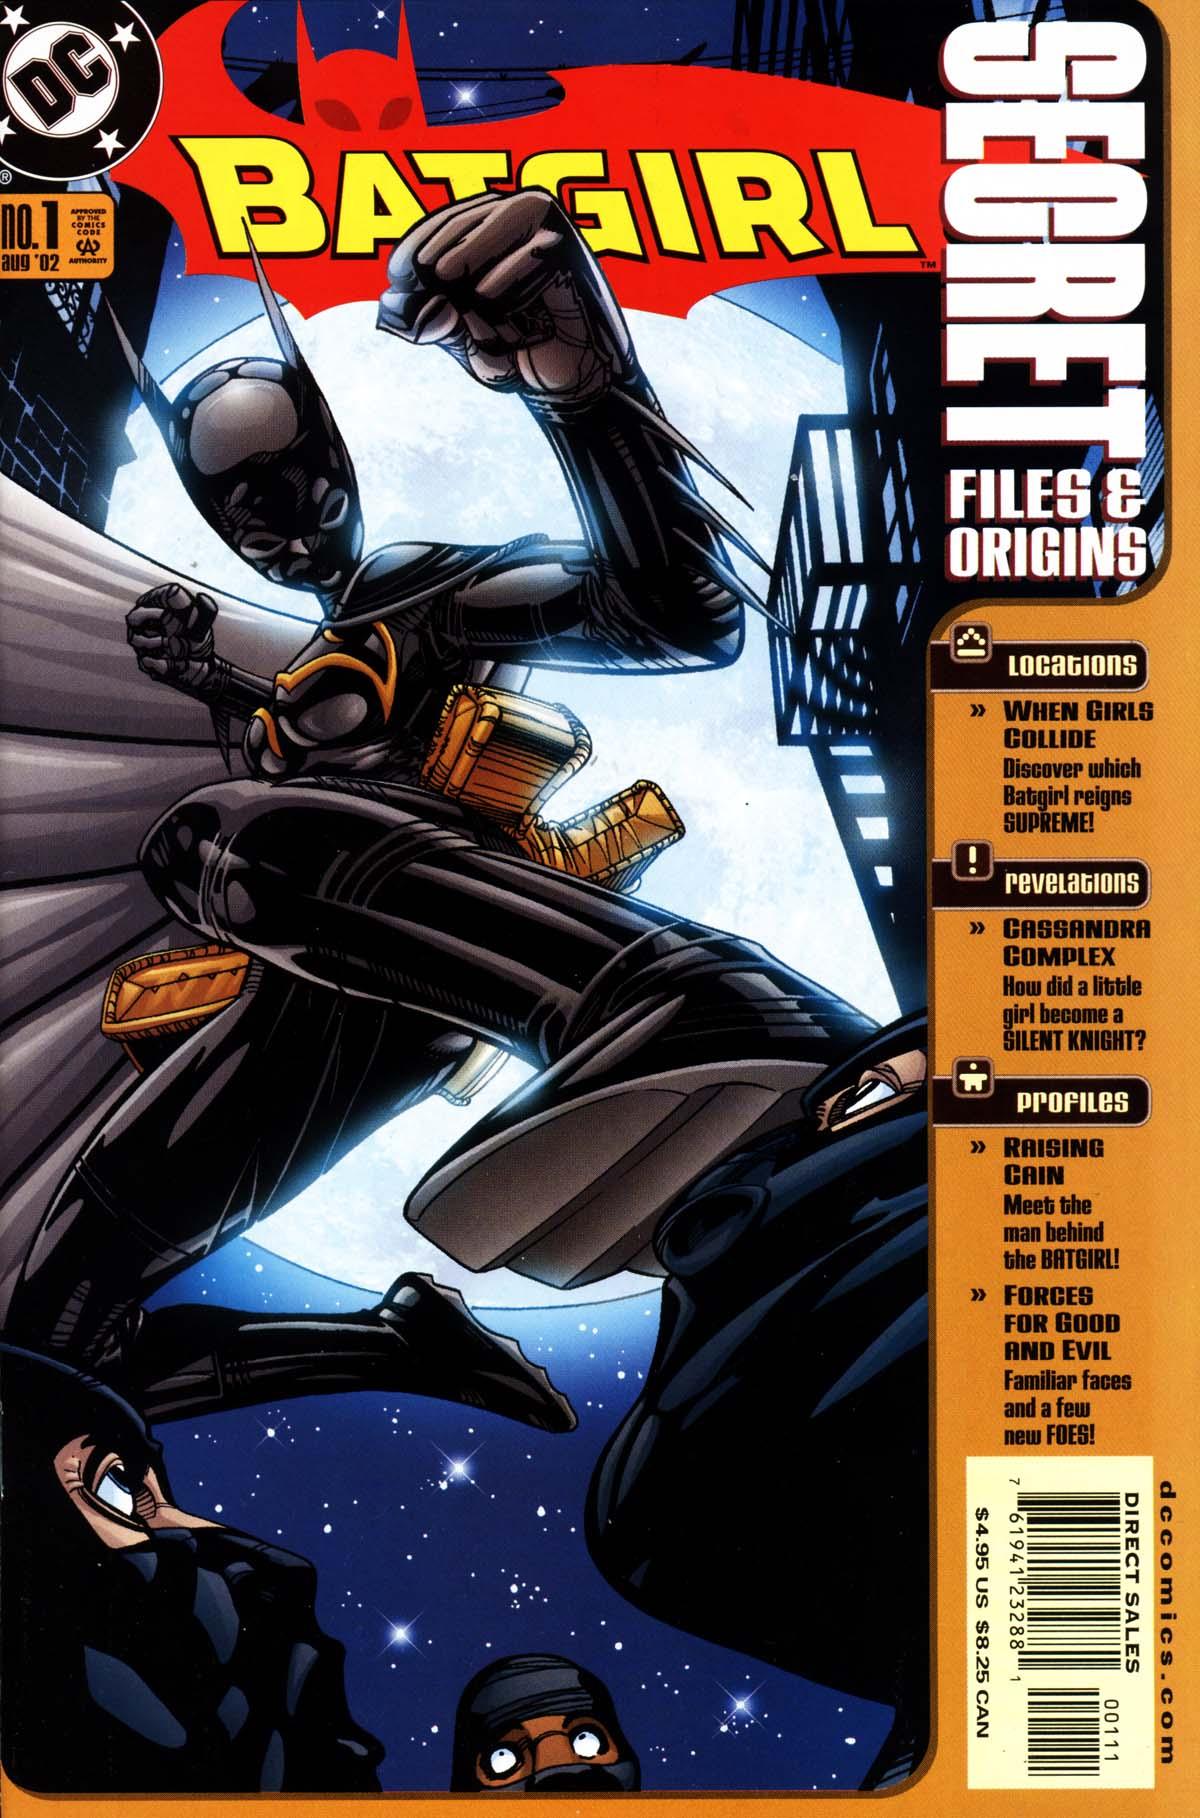 Read online Batgirl Secret Files and Origins comic -  Issue # Full - 1